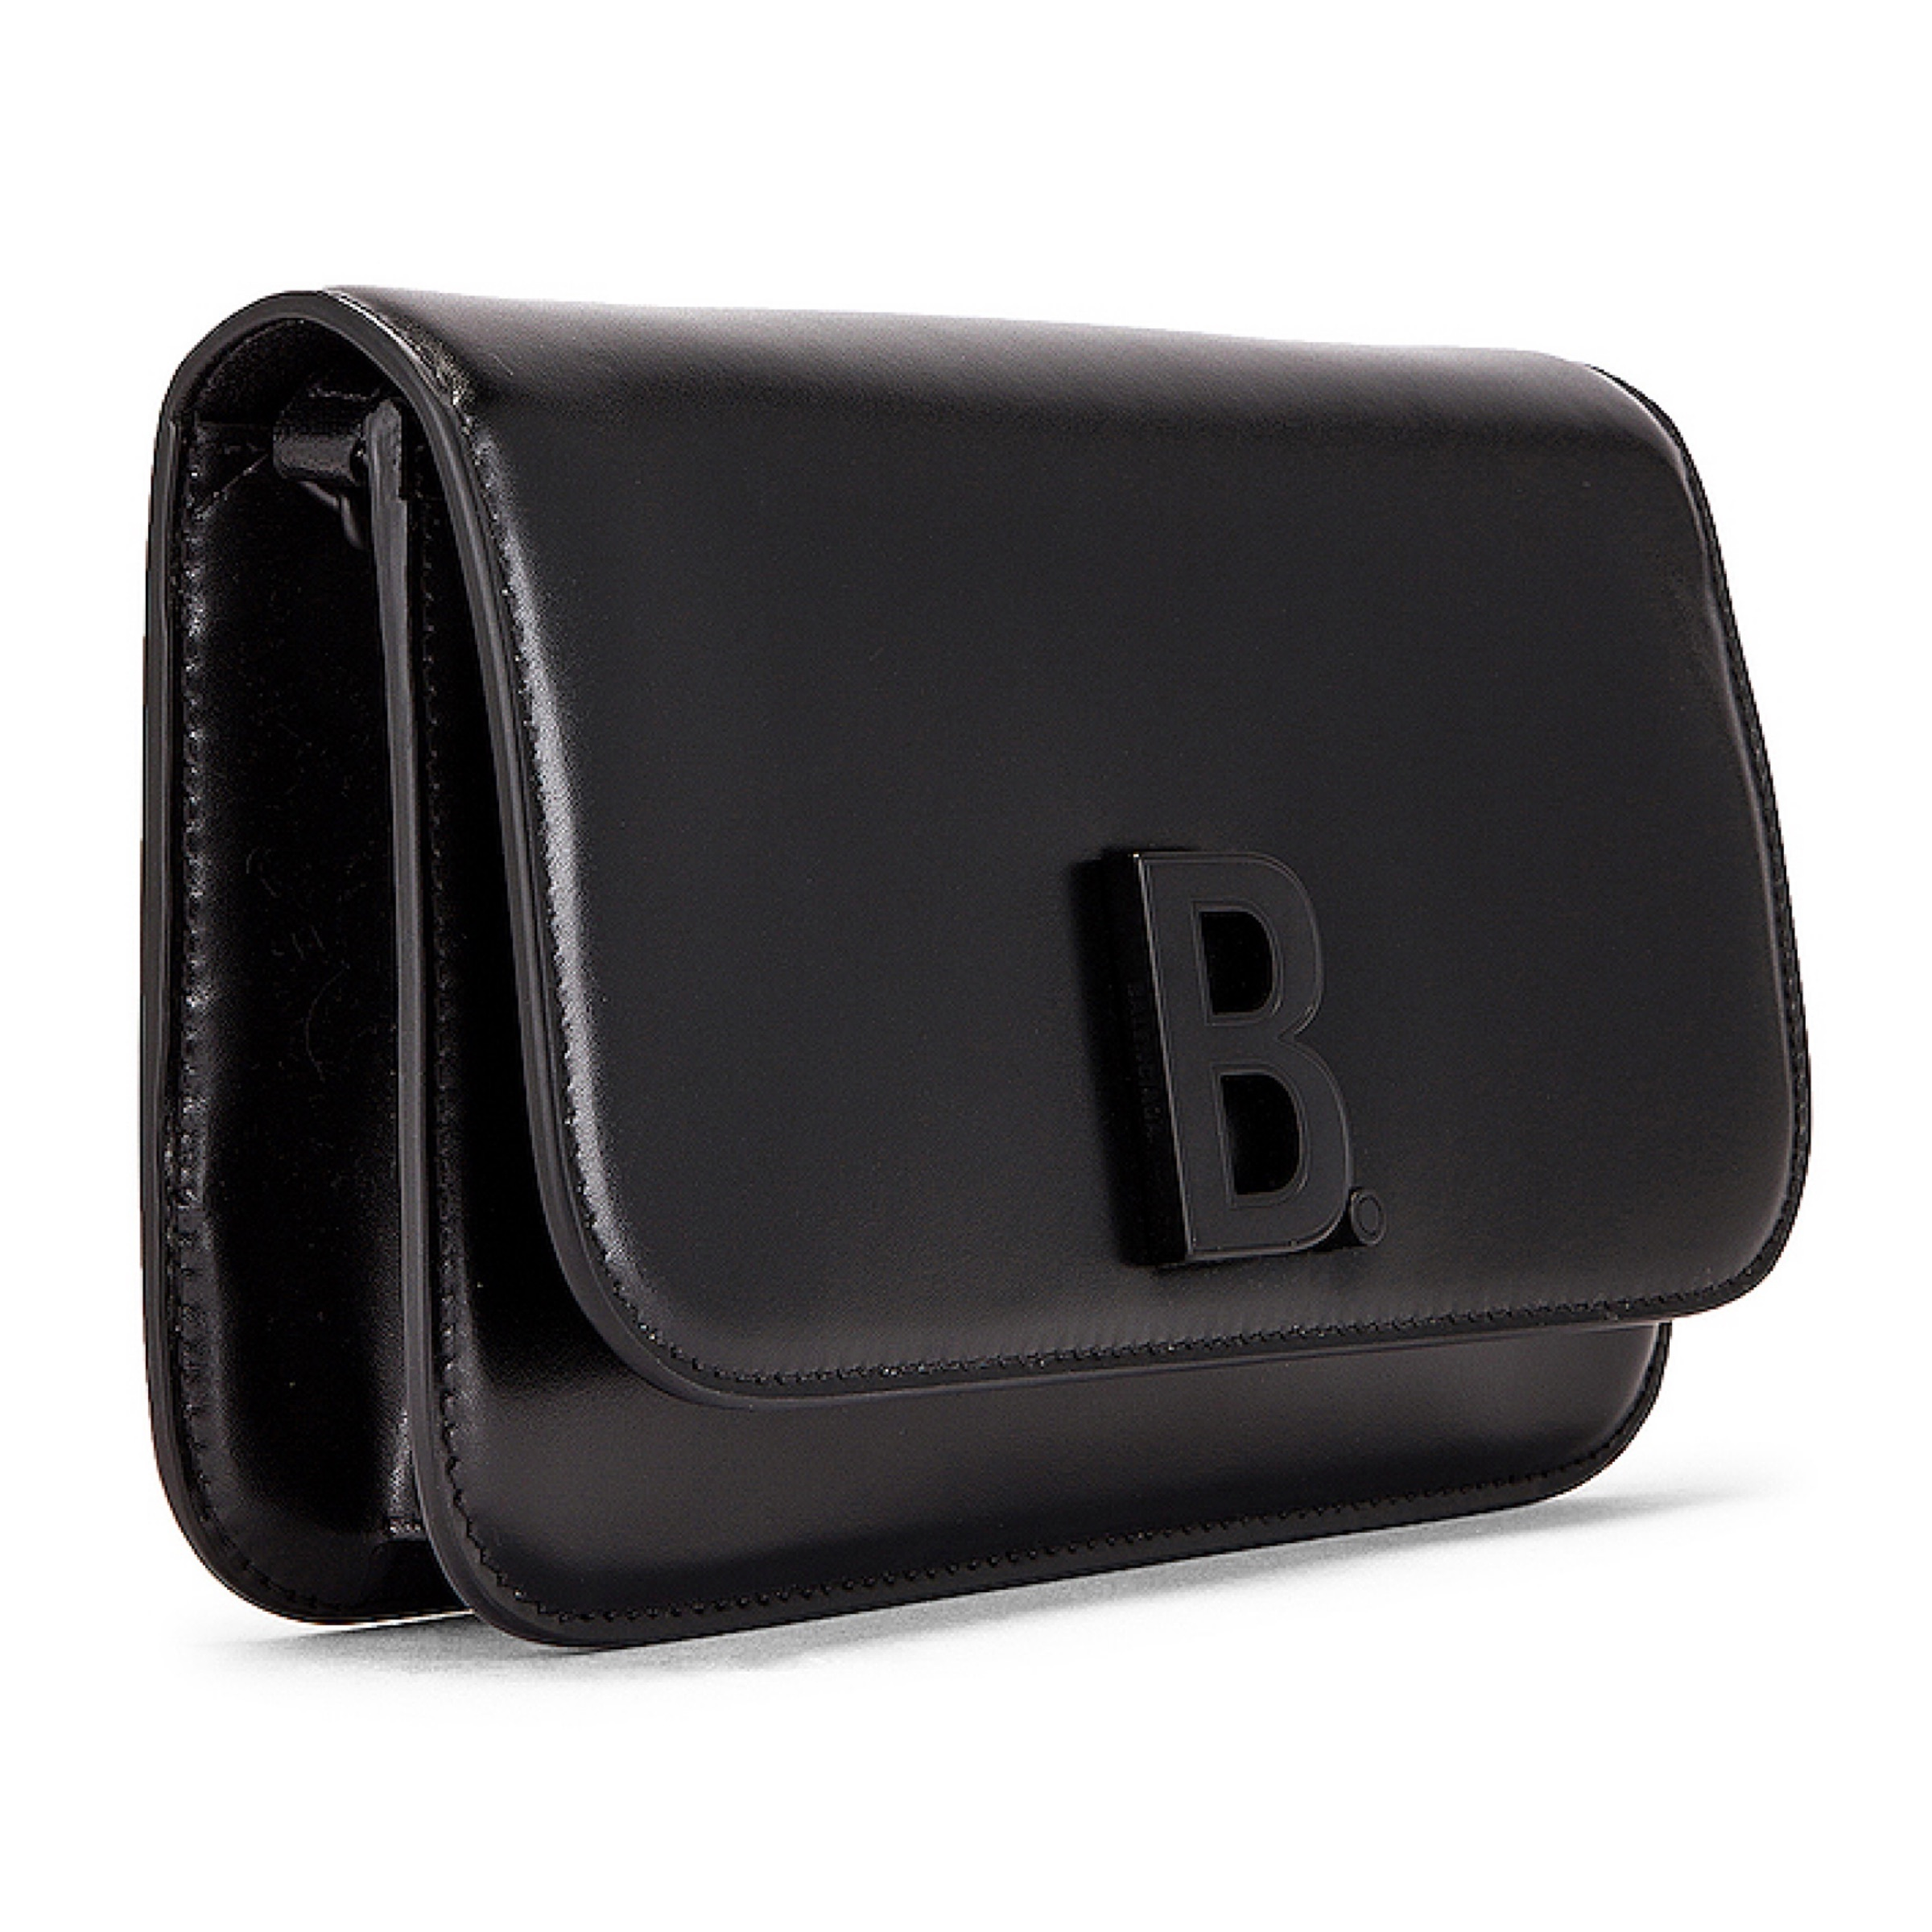 BALENCIAGA NEW Balenciaga Black B Logo Leather Wallet on Chain Bag